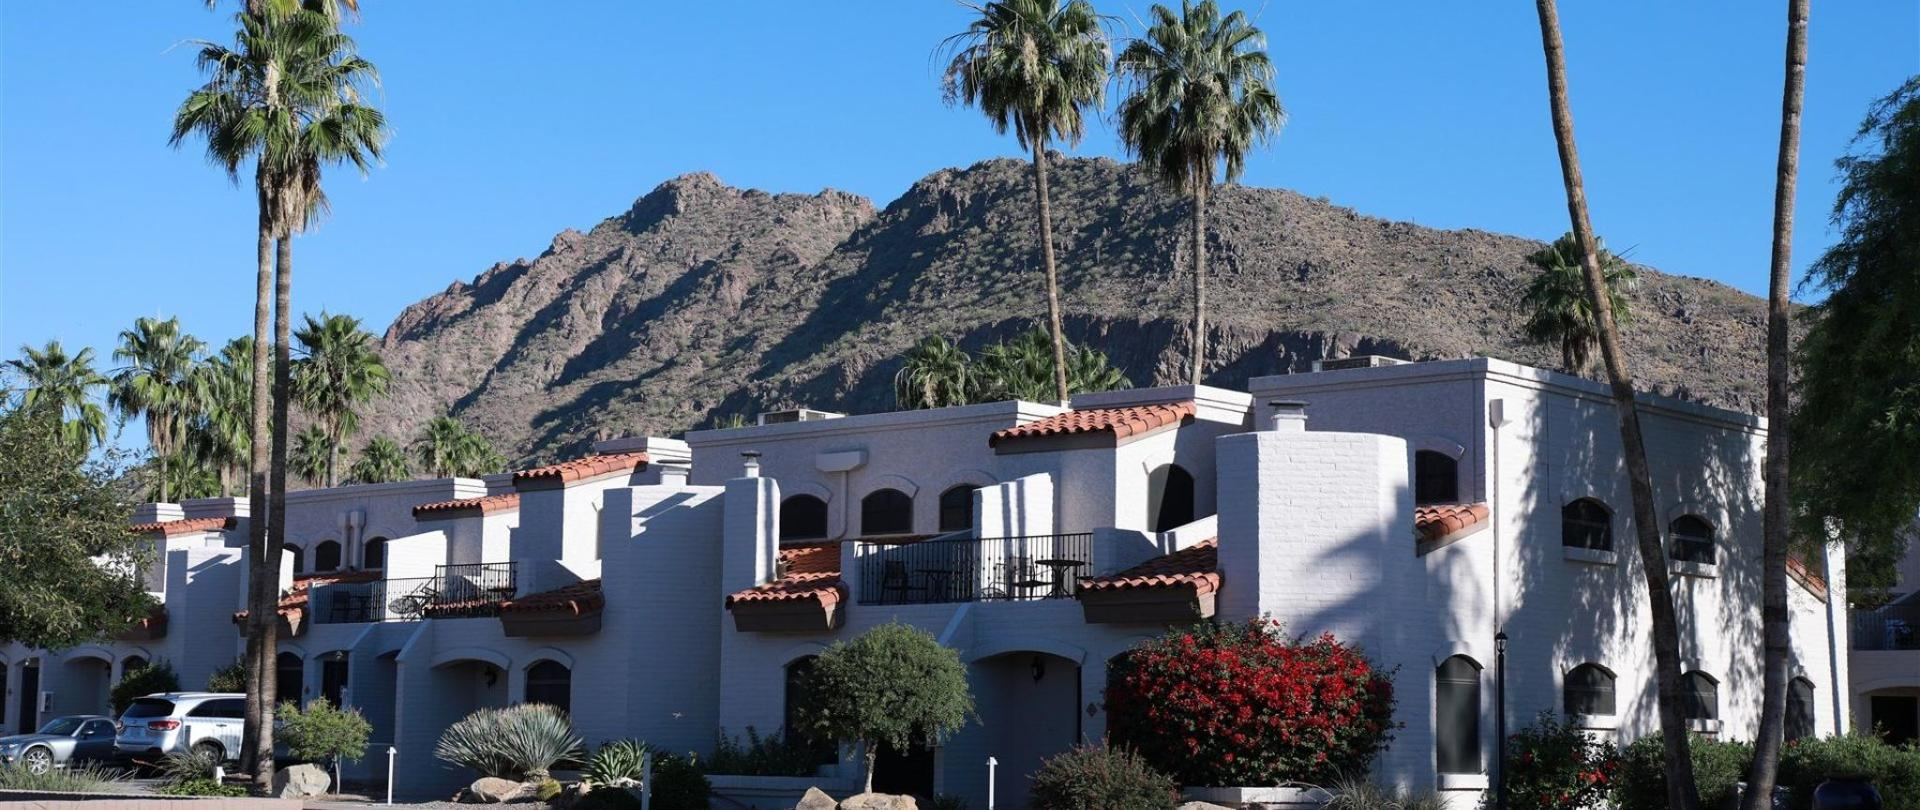 Scottsdale Camelback Resort